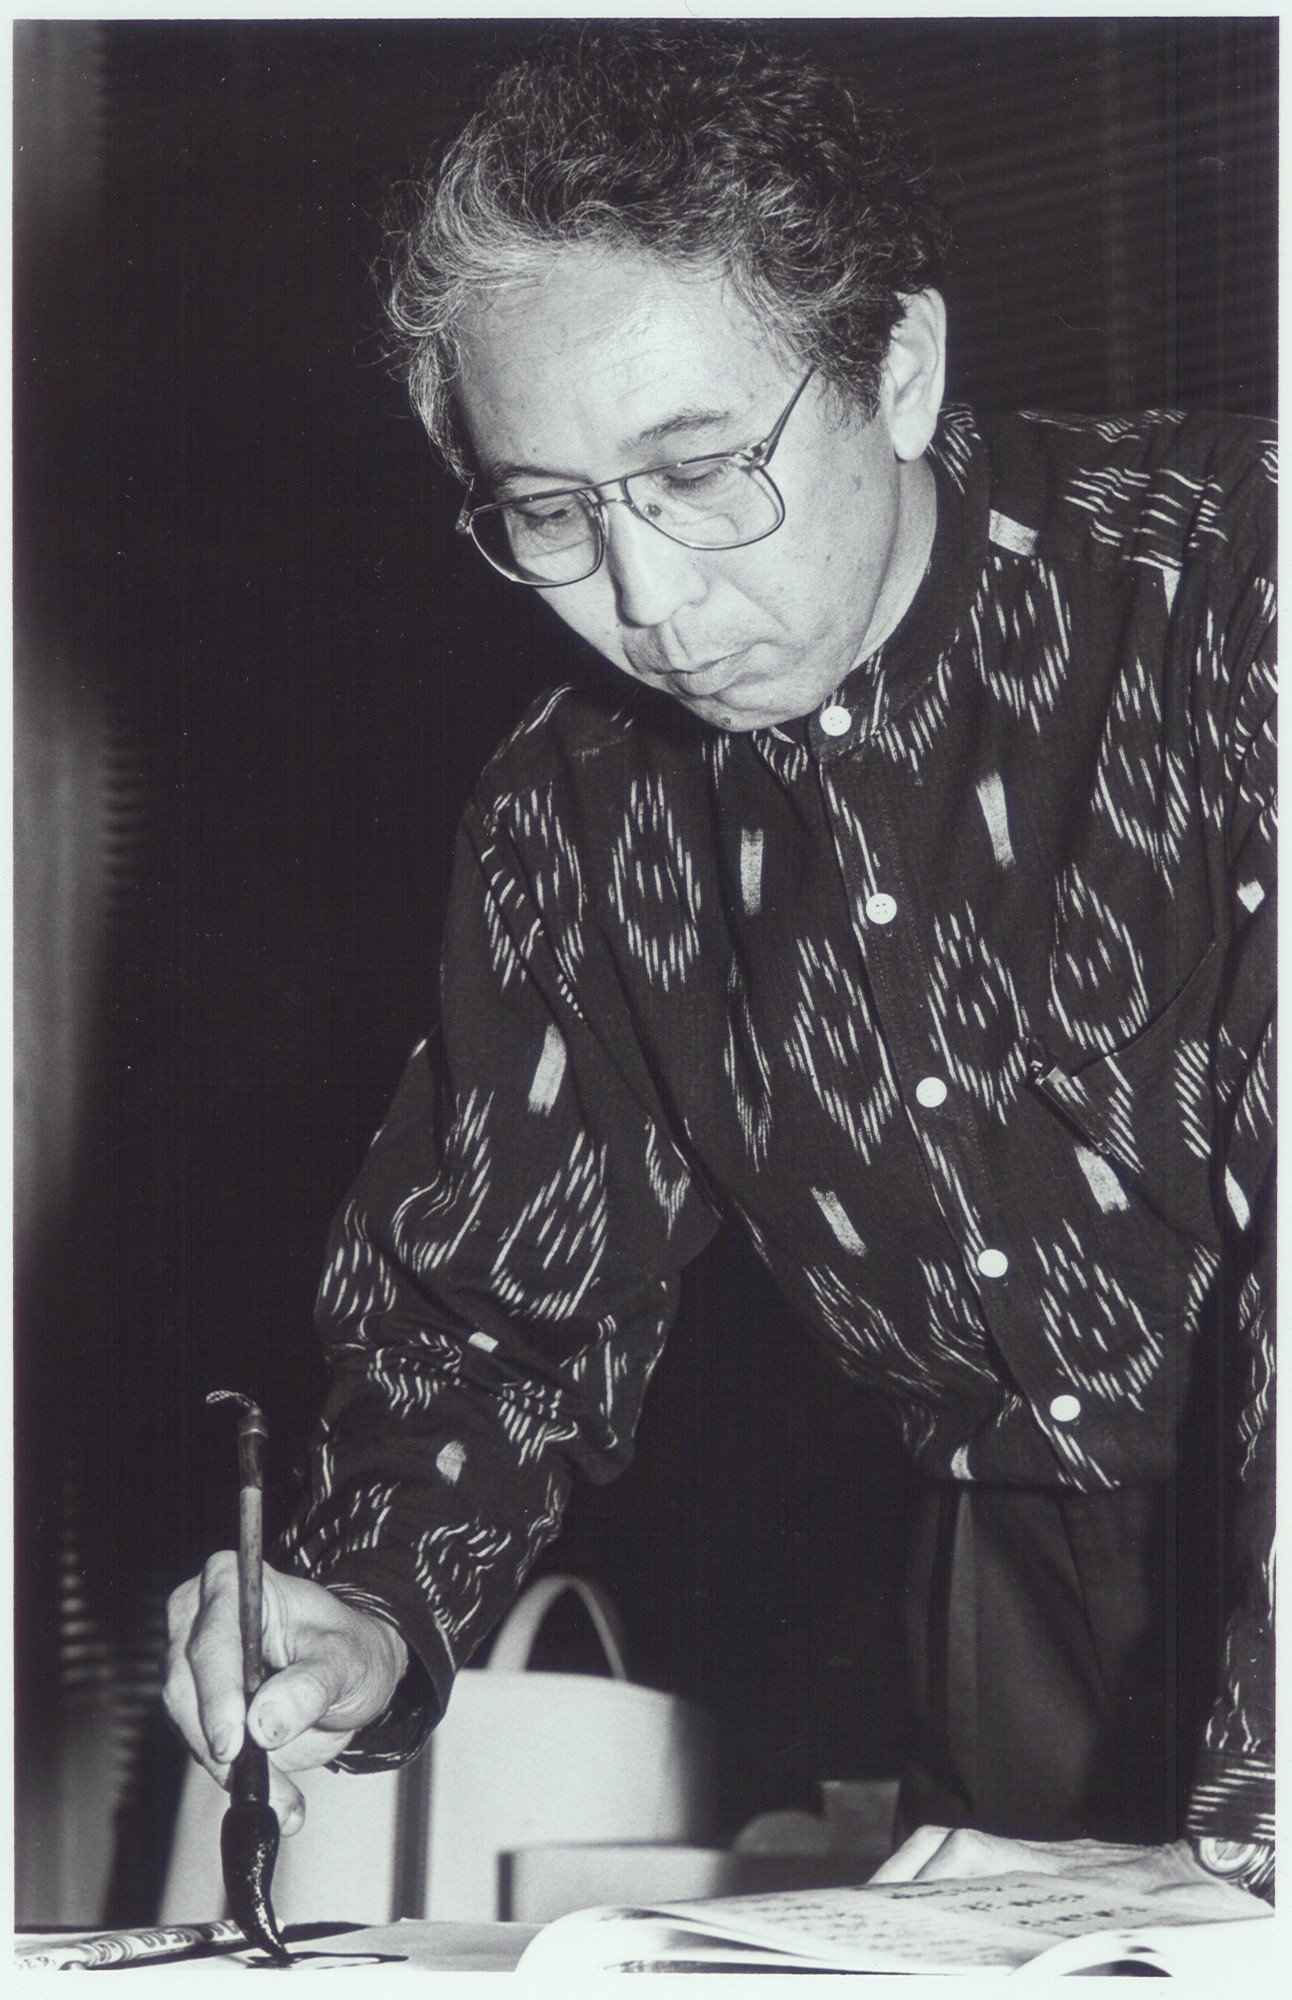 Ron Nakasone